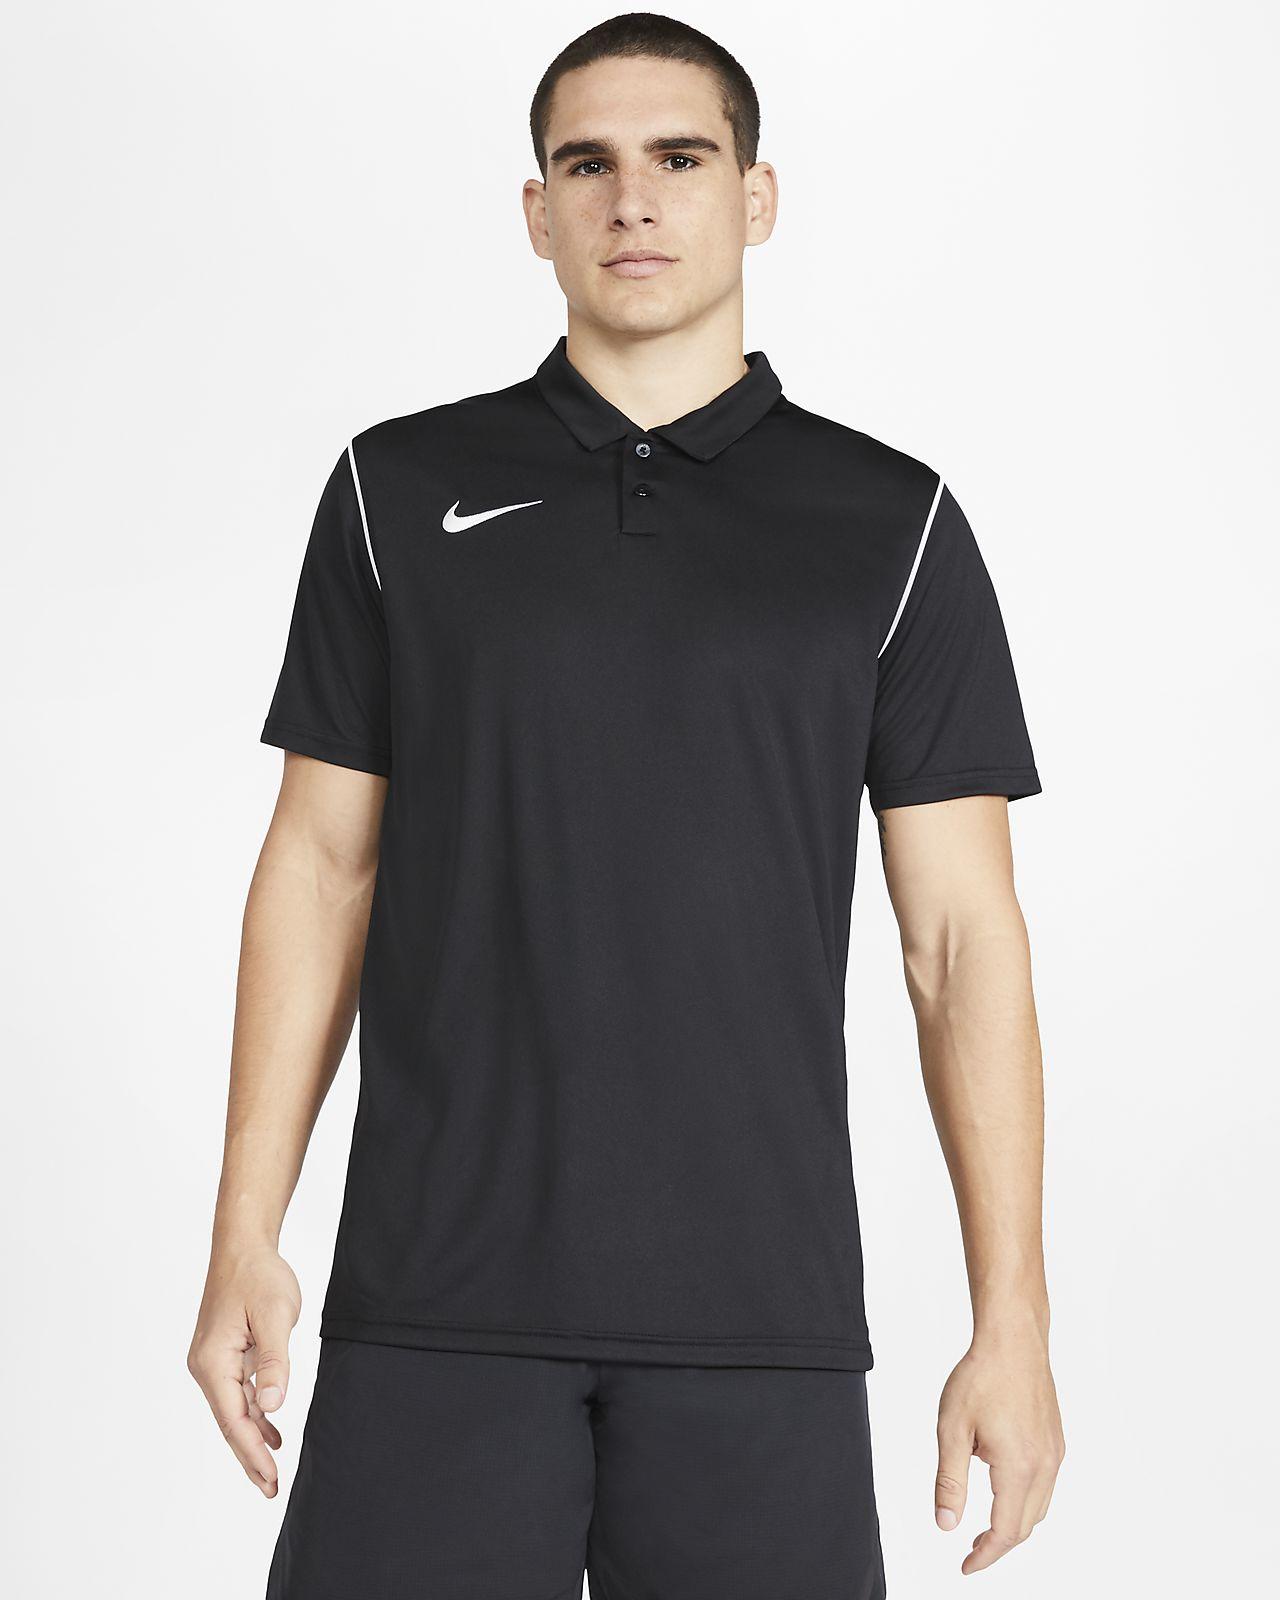 Nike Dri-FIT Park Men's Soccer Polo